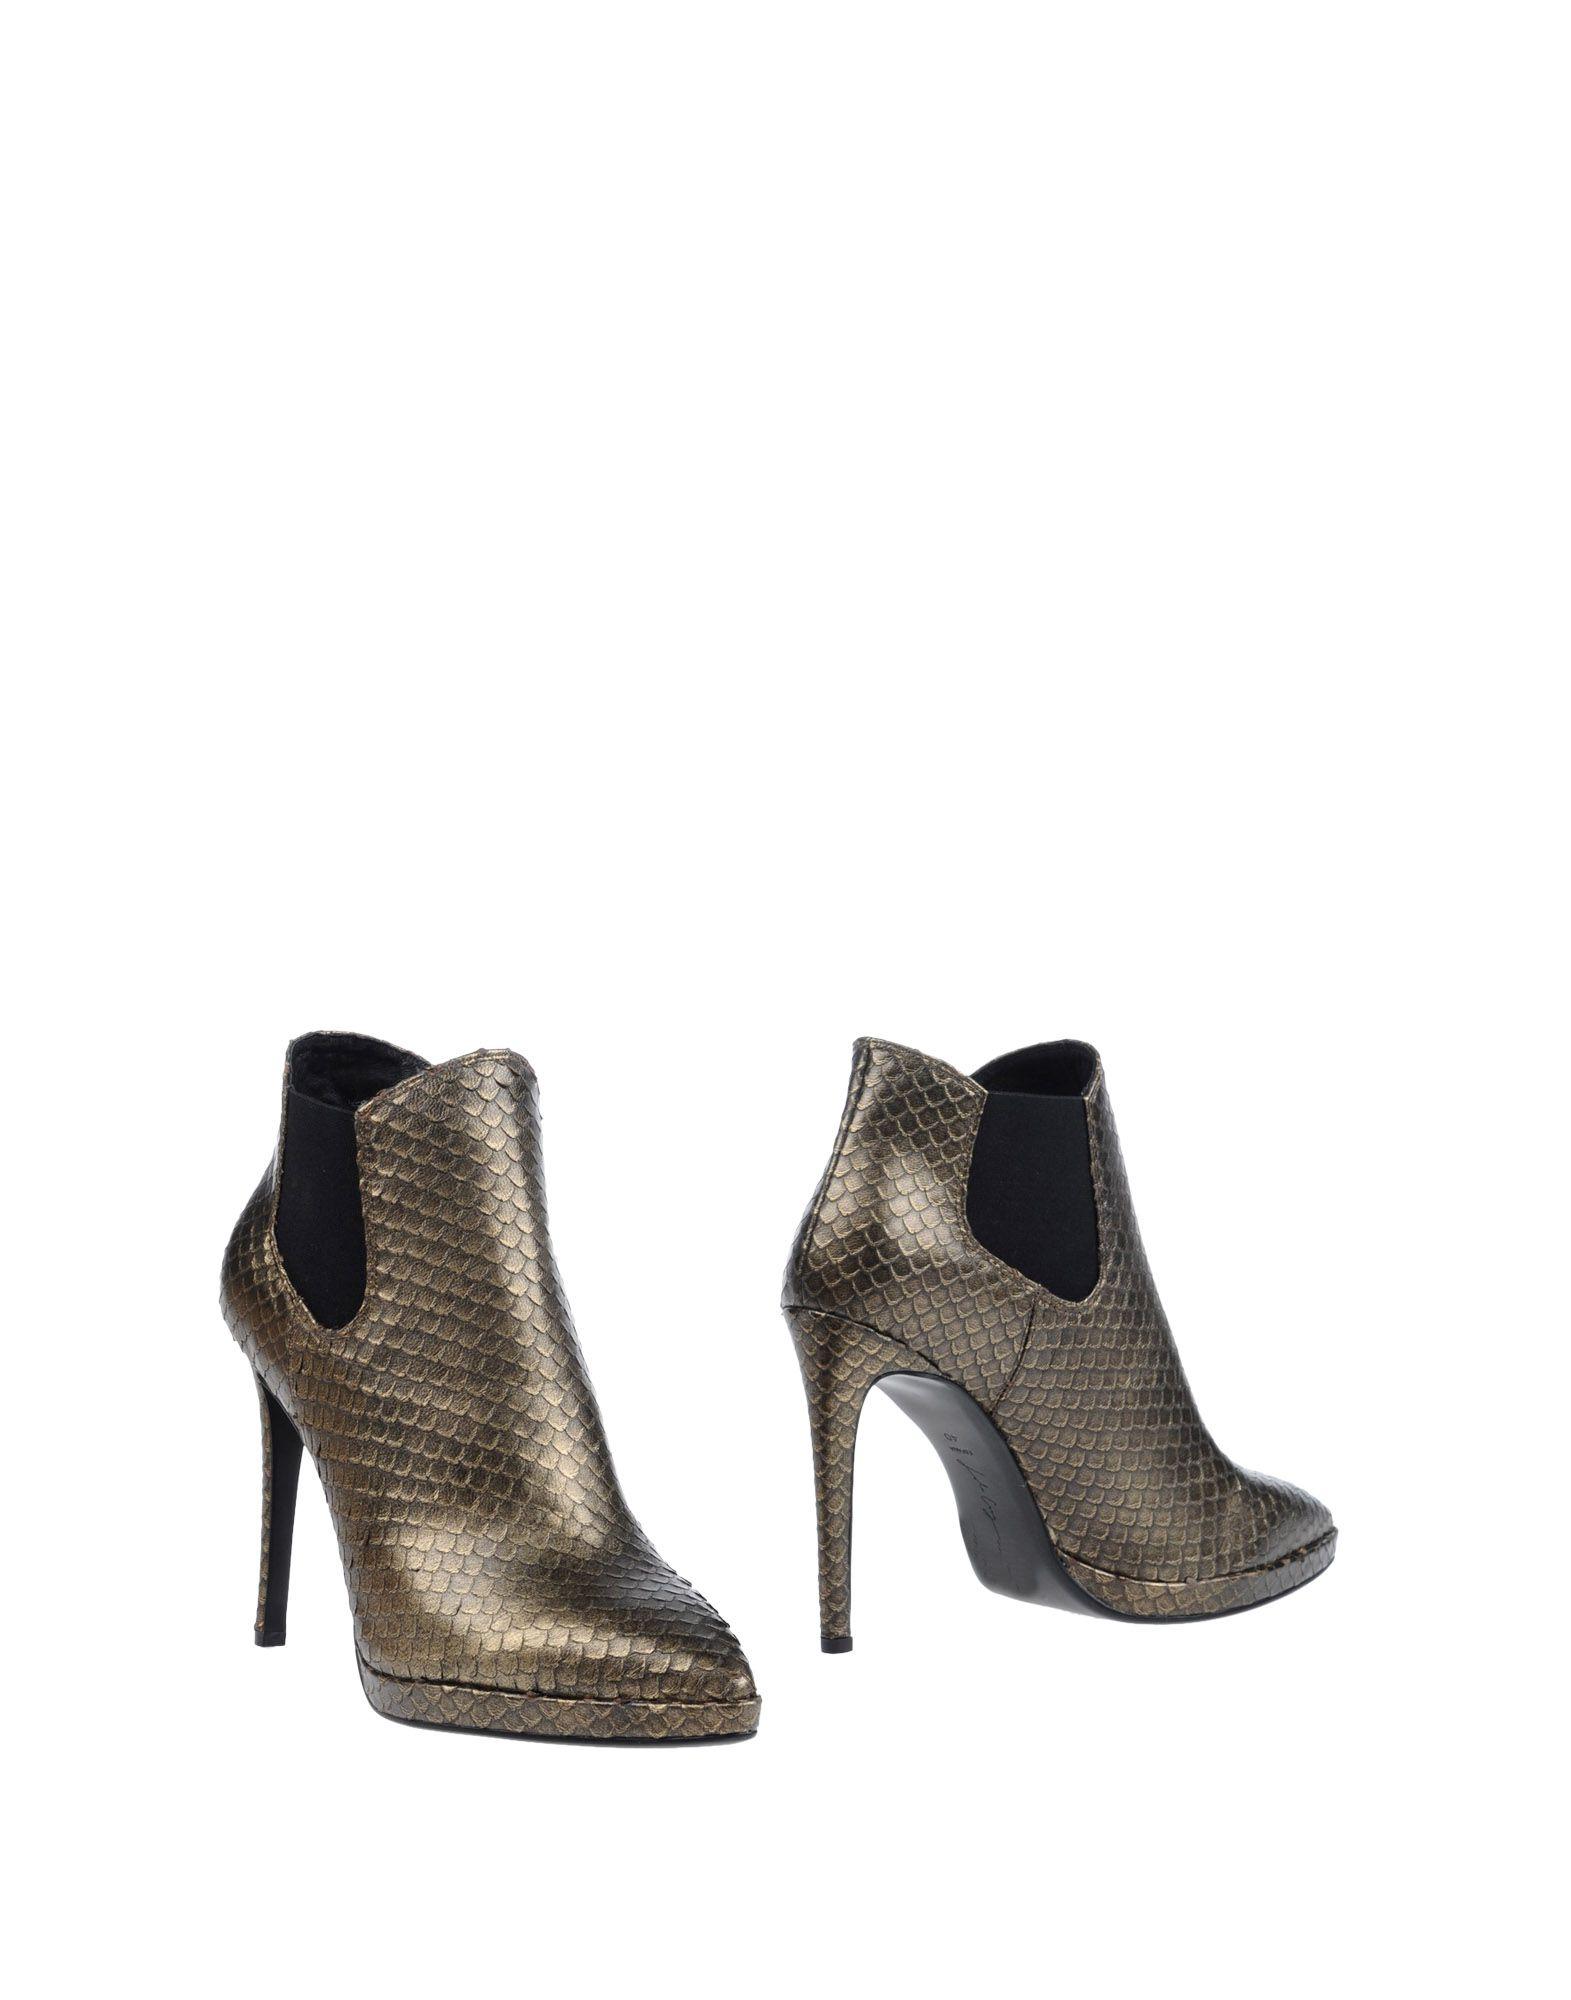 LOLA CRUZ Полусапоги и высокие ботинки lola cruz полусапоги и высокие ботинки